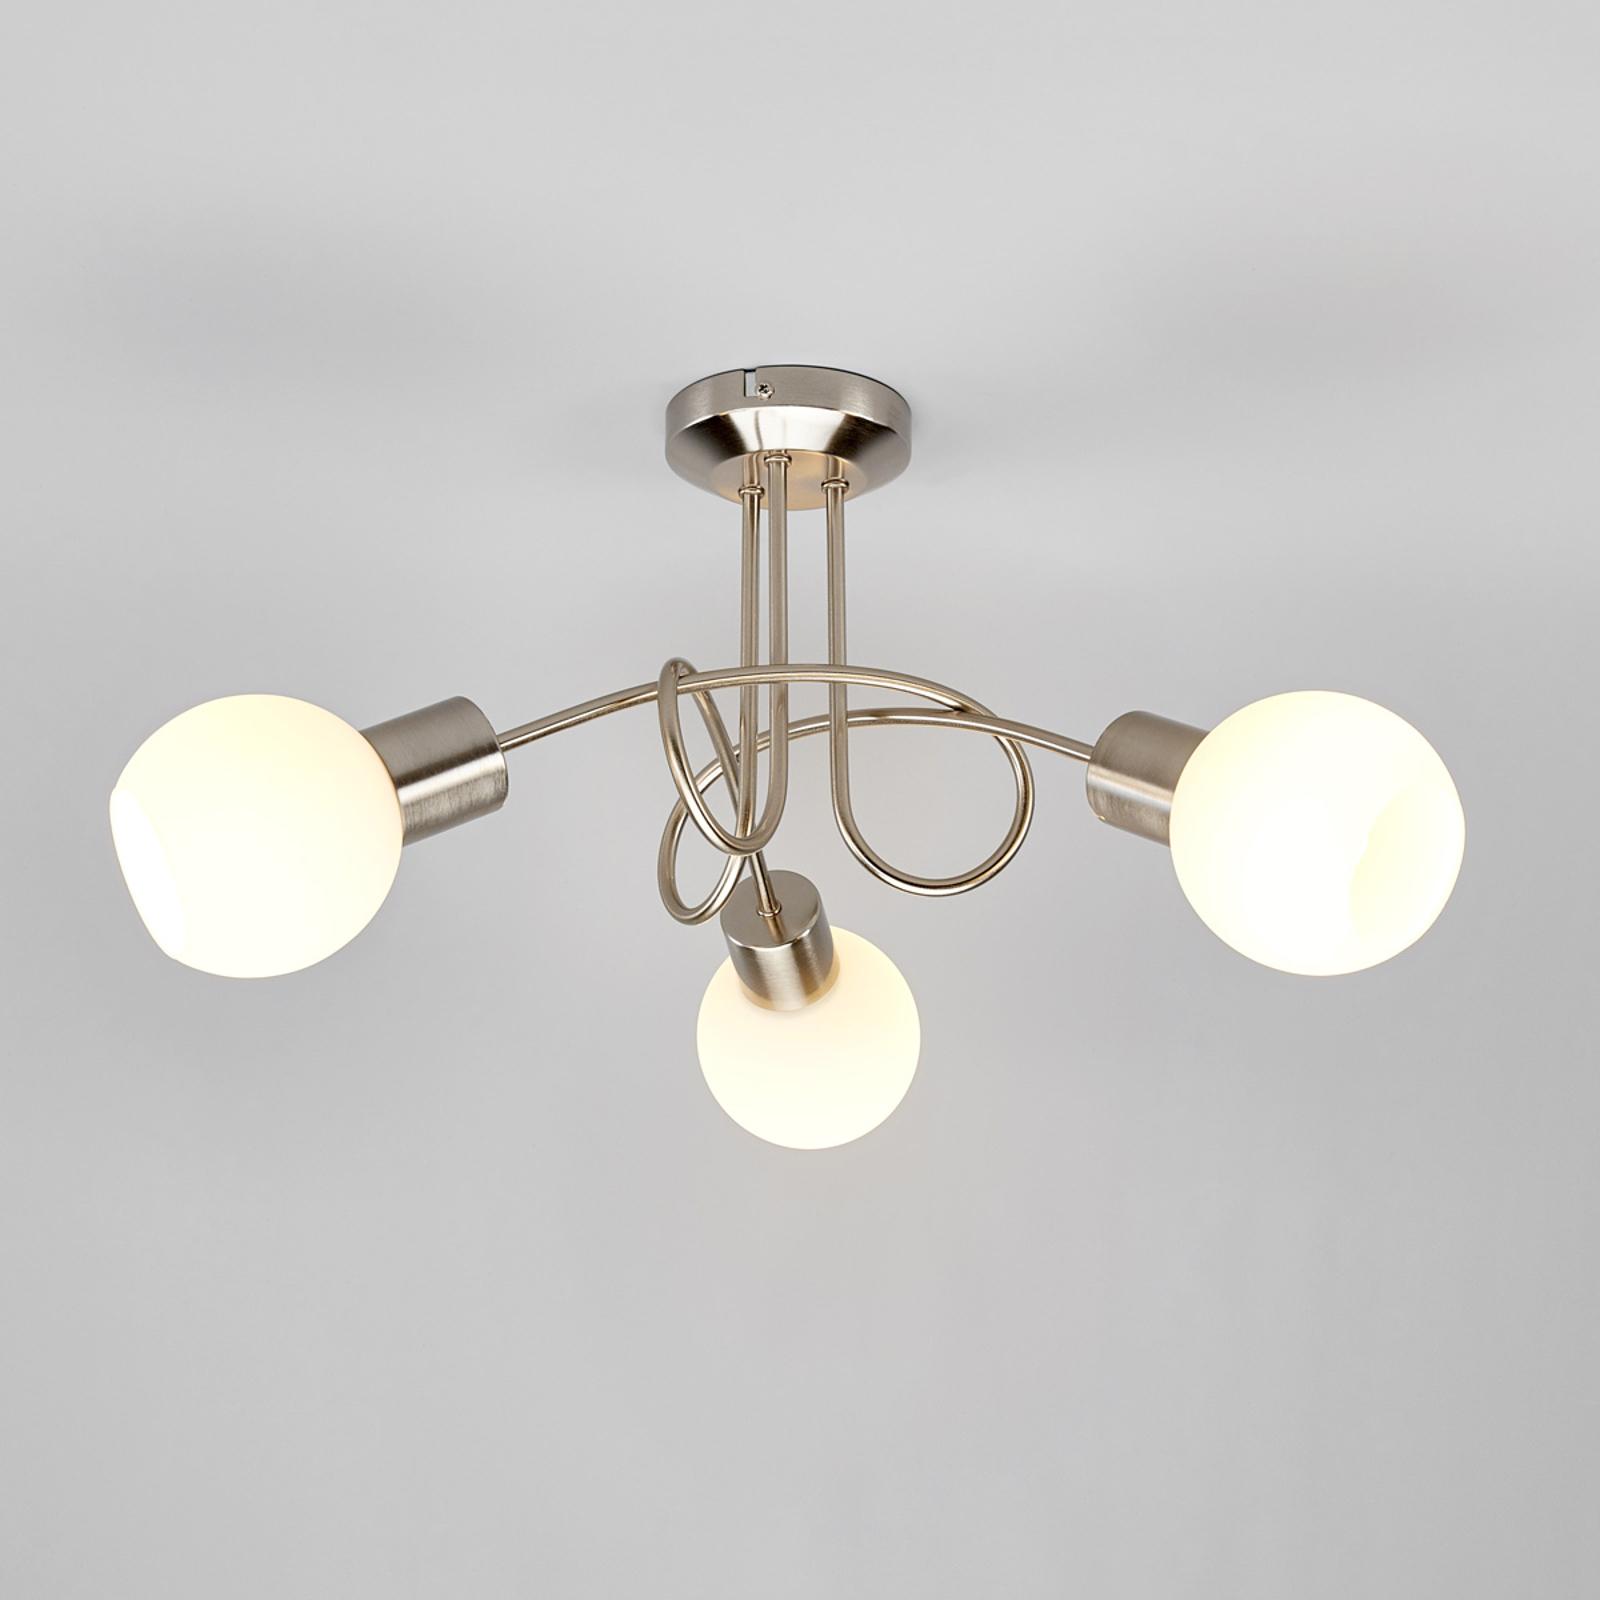 LED-Deckenleuchte Elaina 3-flg., nickel matt